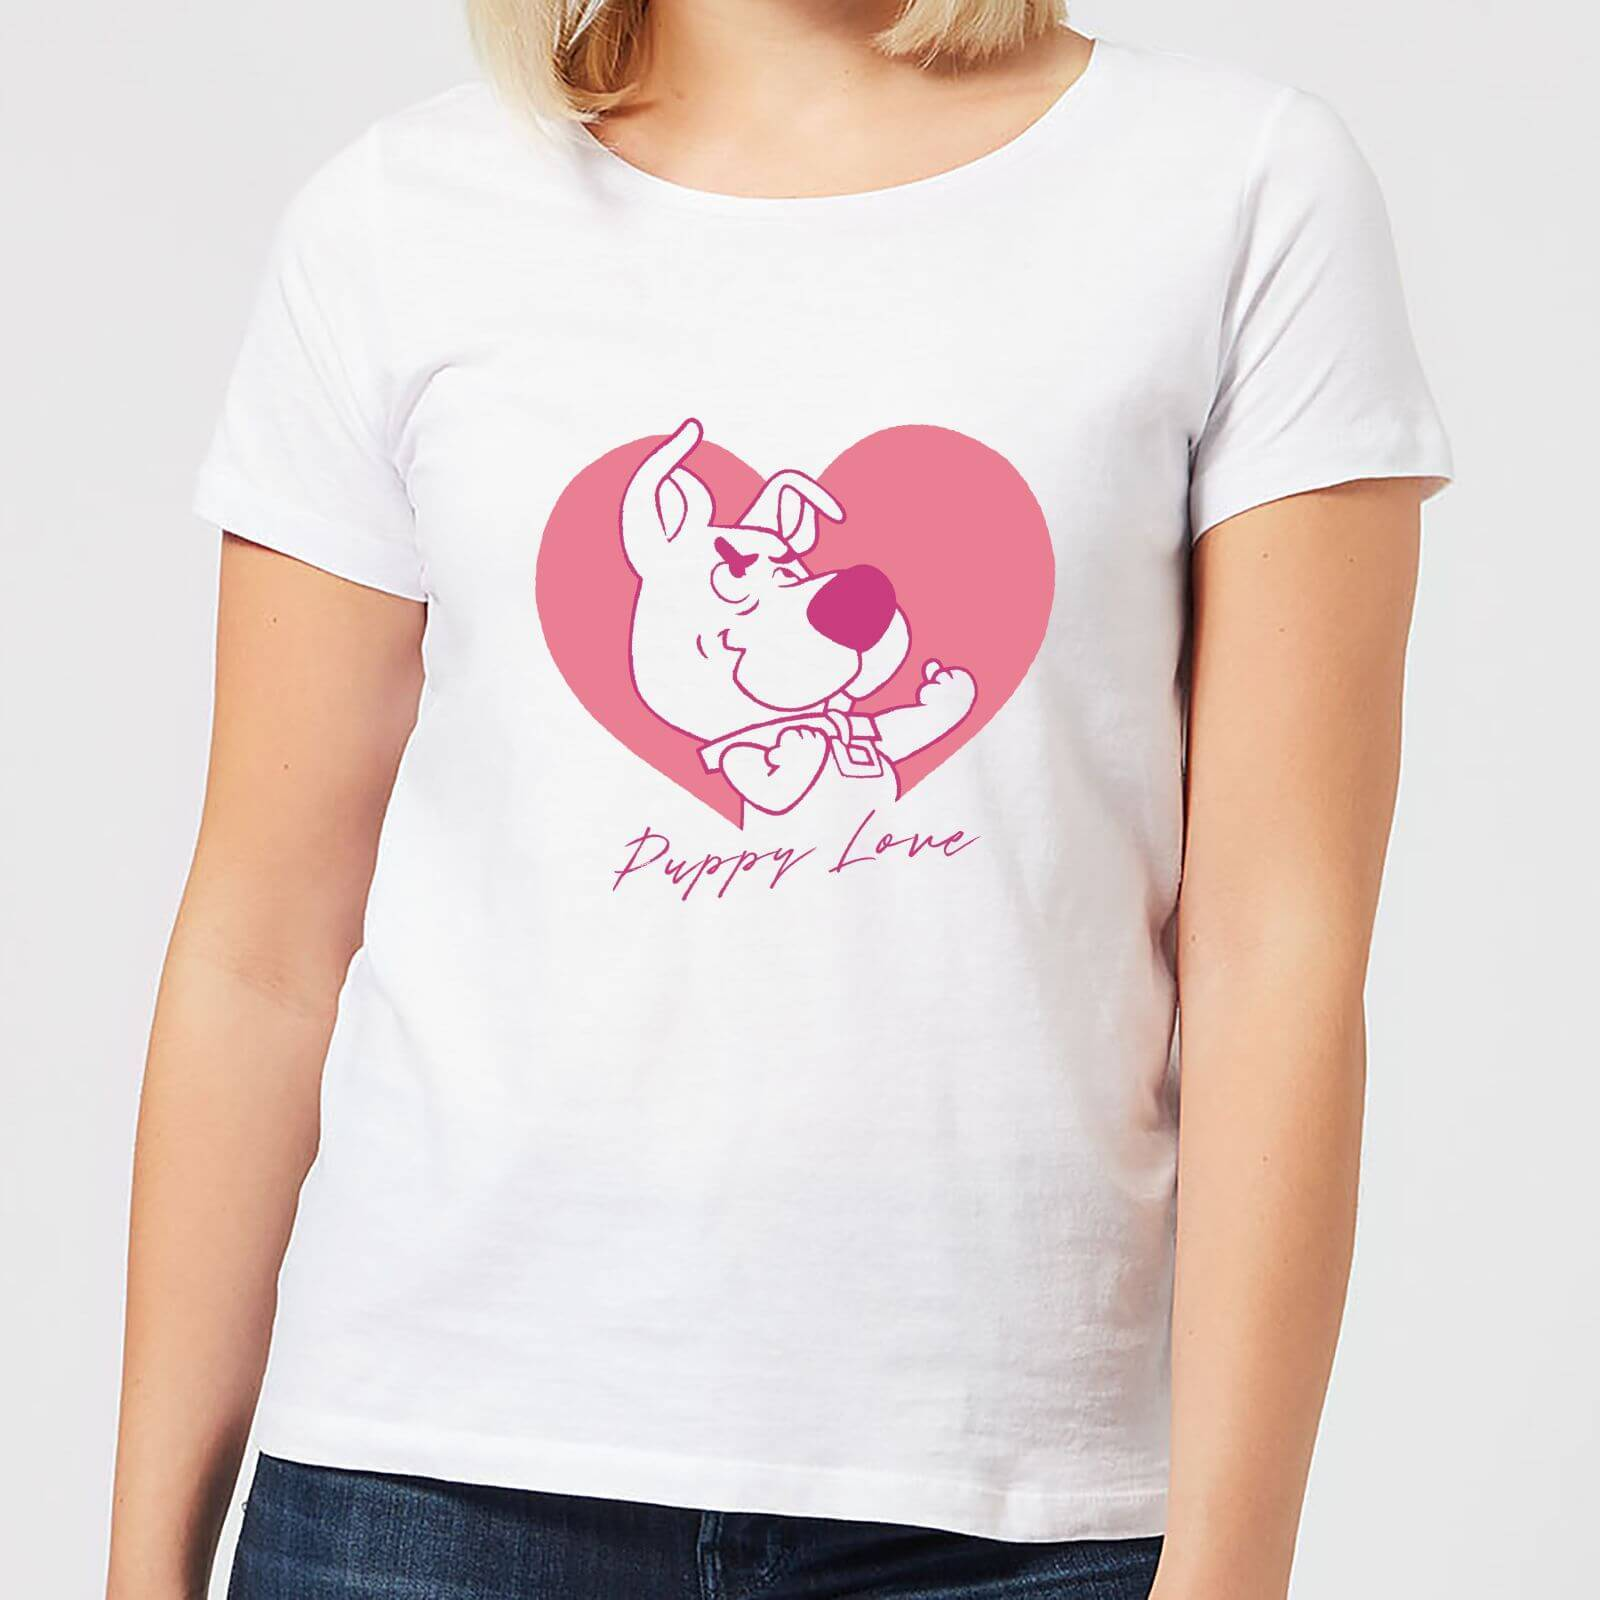 Scooby Doo Puppy Love Women's T-Shirt - White - S - White